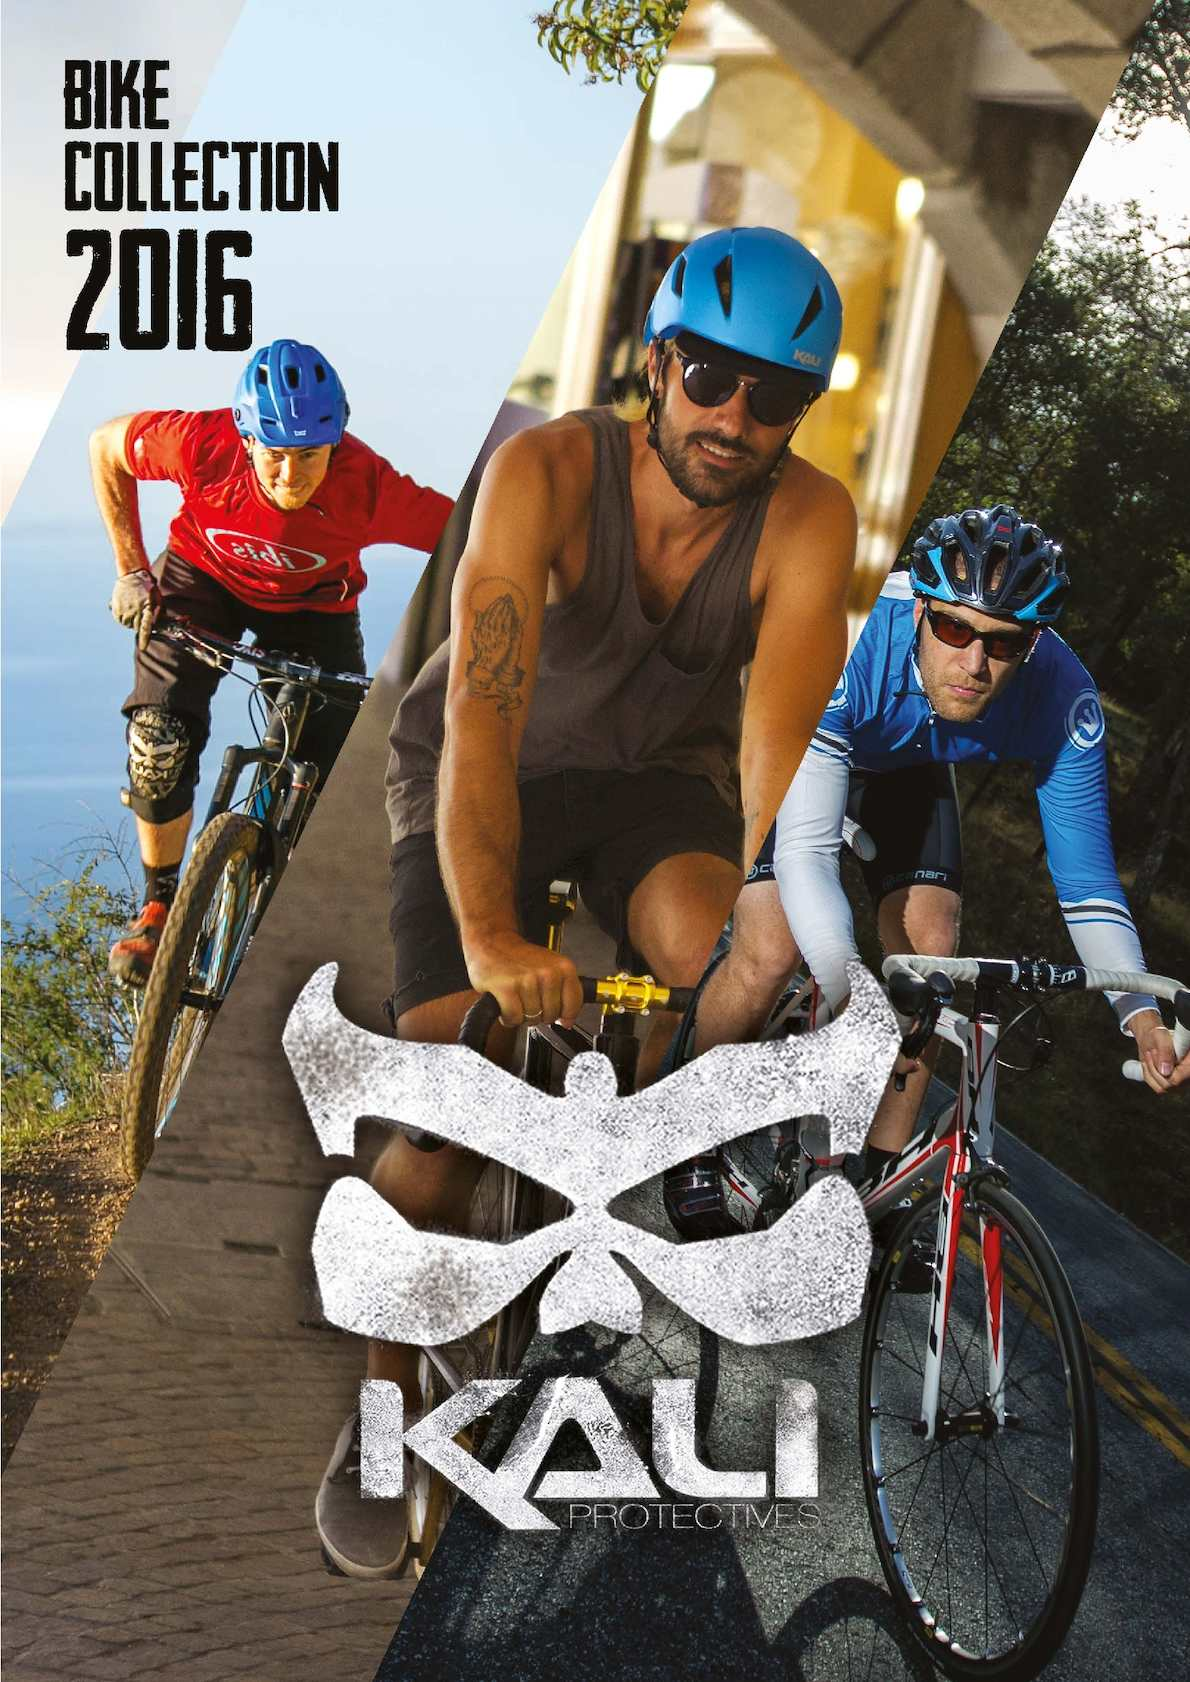 New Kali Protectives Aazis Soft Knee Guard Cycling Biking